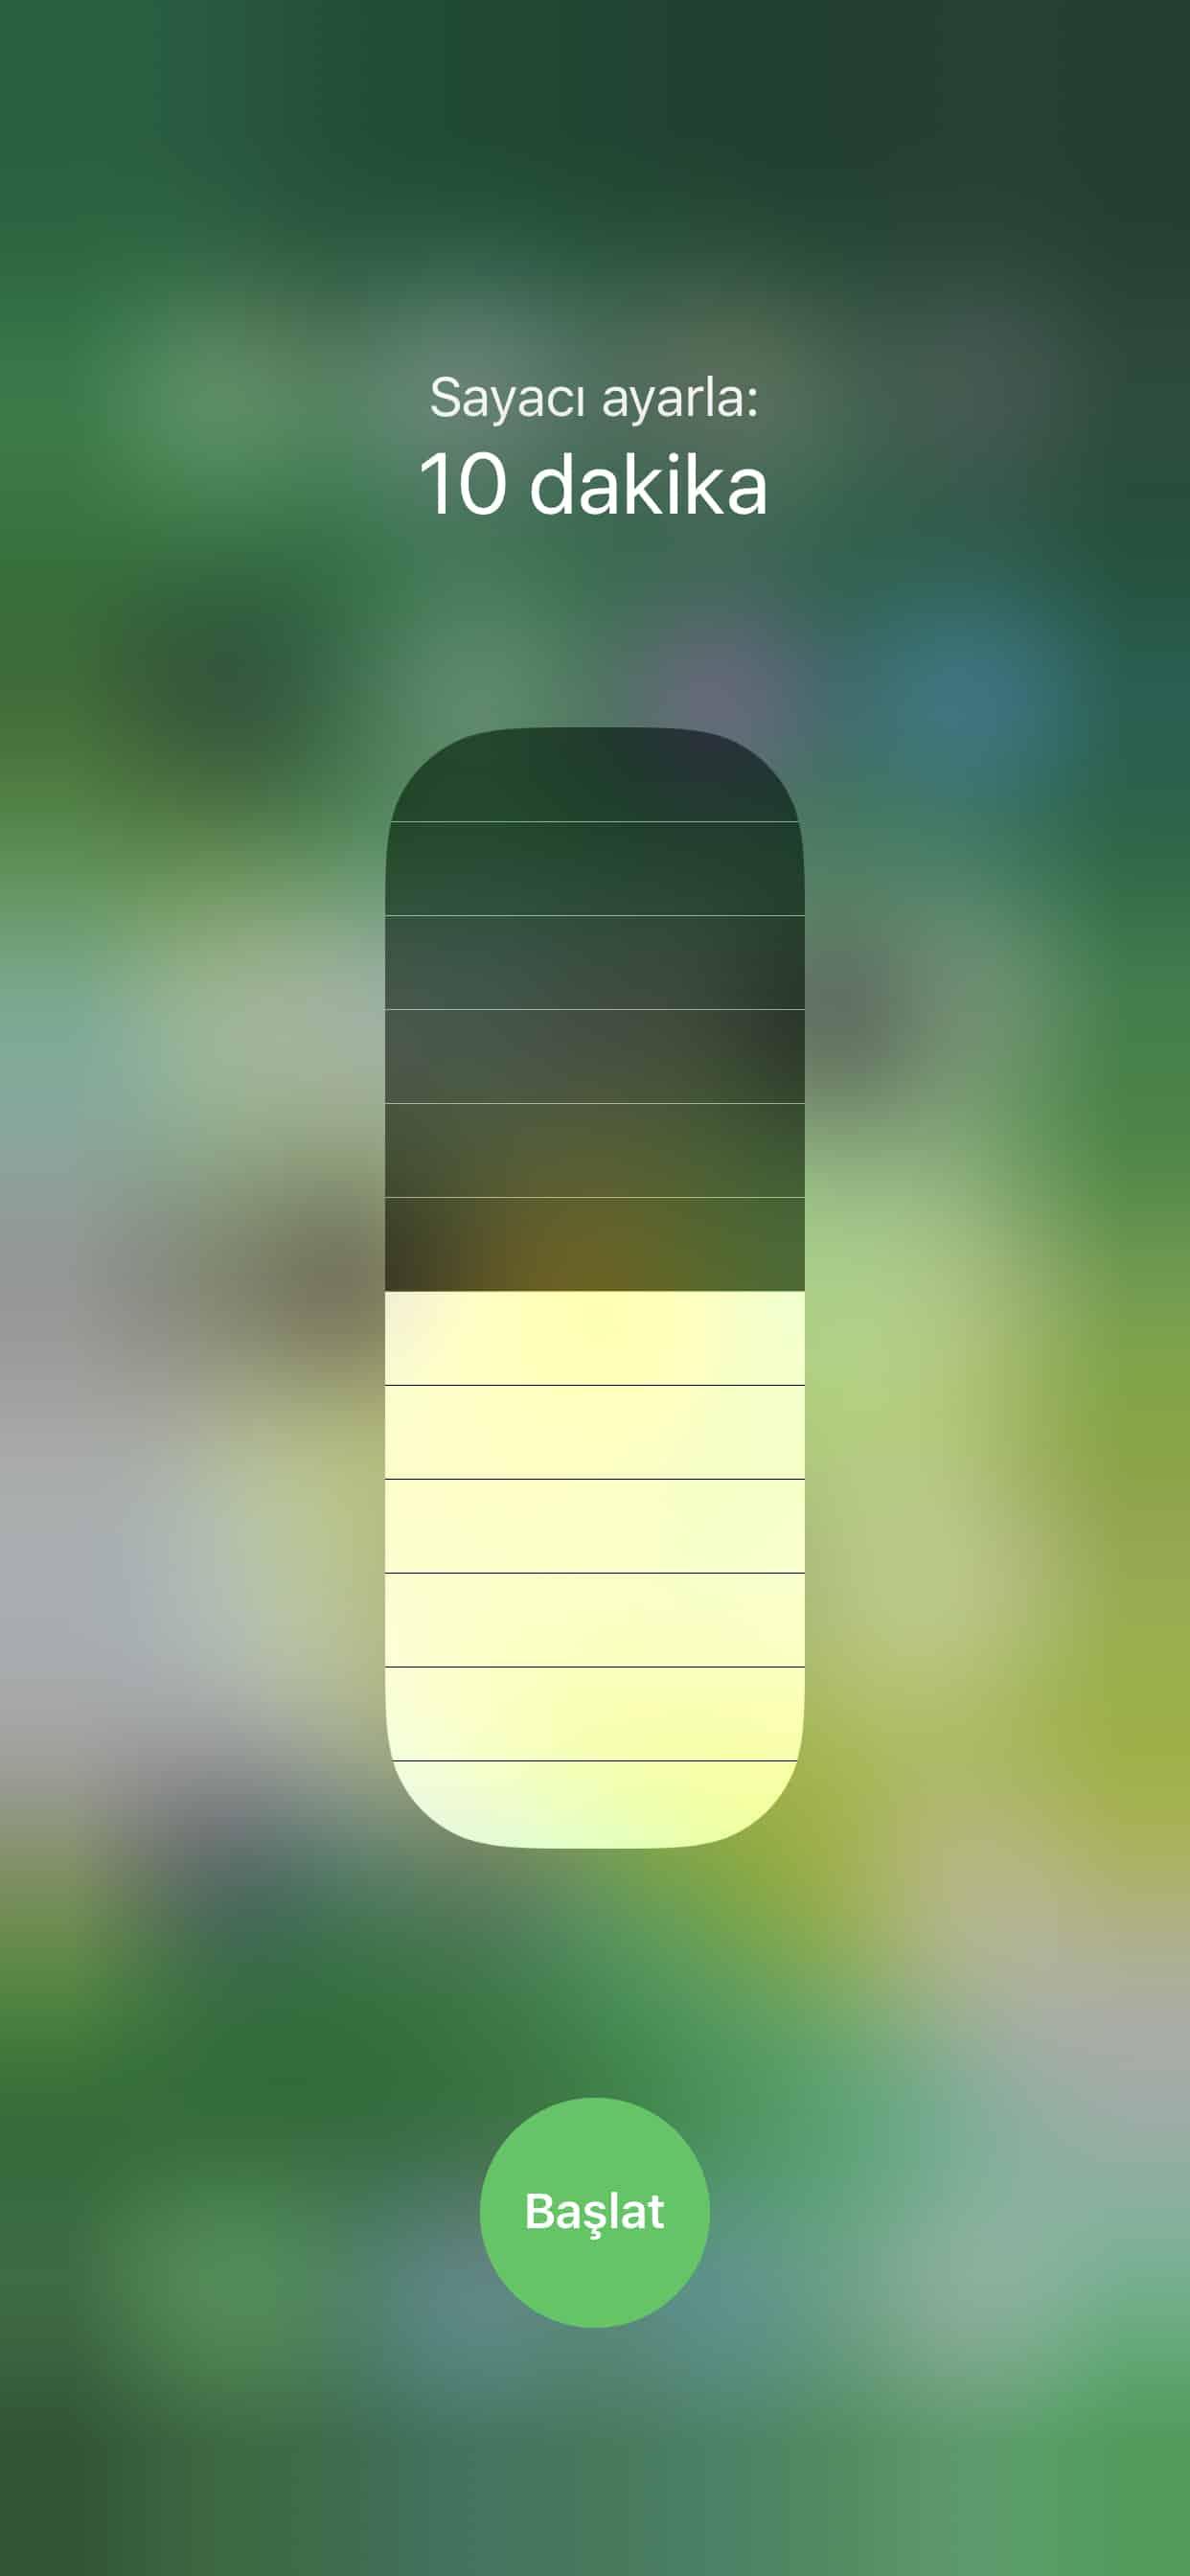 iphone sayaç kurulumu